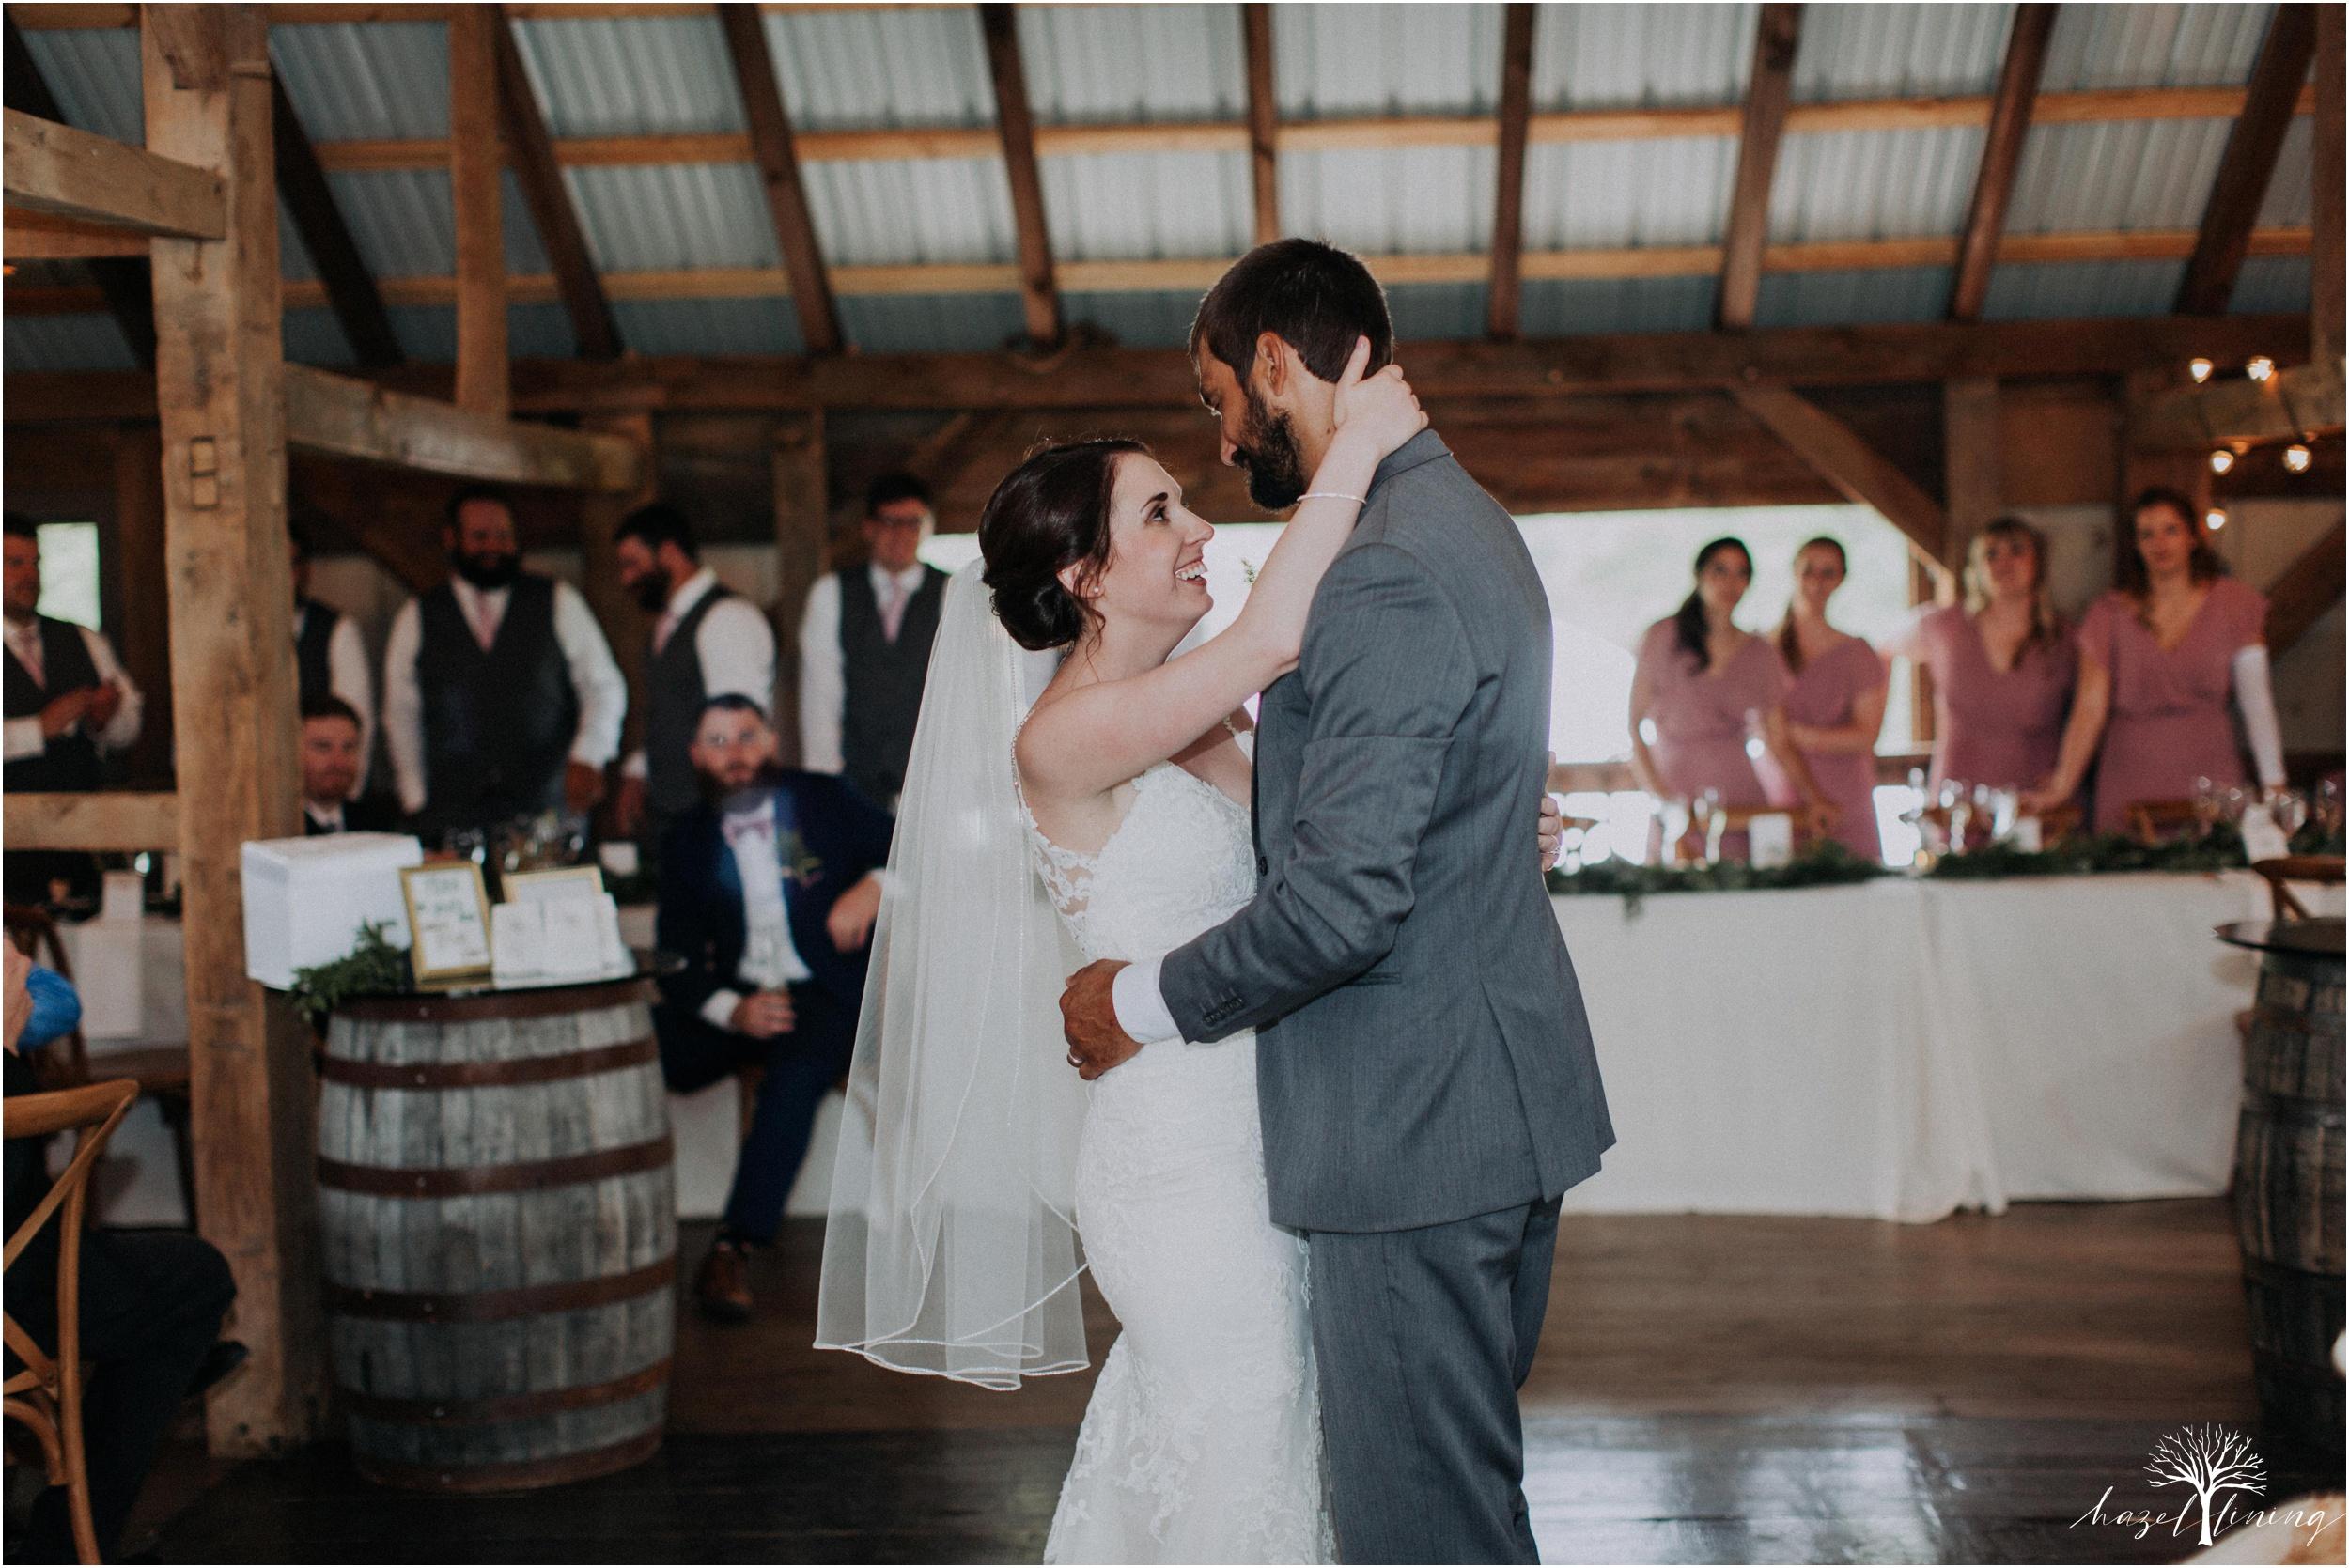 hazel-lining-travel-wedding-elopement-photography-lisa-landon-shoemaker-the-farm-bakery-and-events-bucks-county-quakertown-pennsylvania-summer-country-outdoor-farm-wedding_0117.jpg